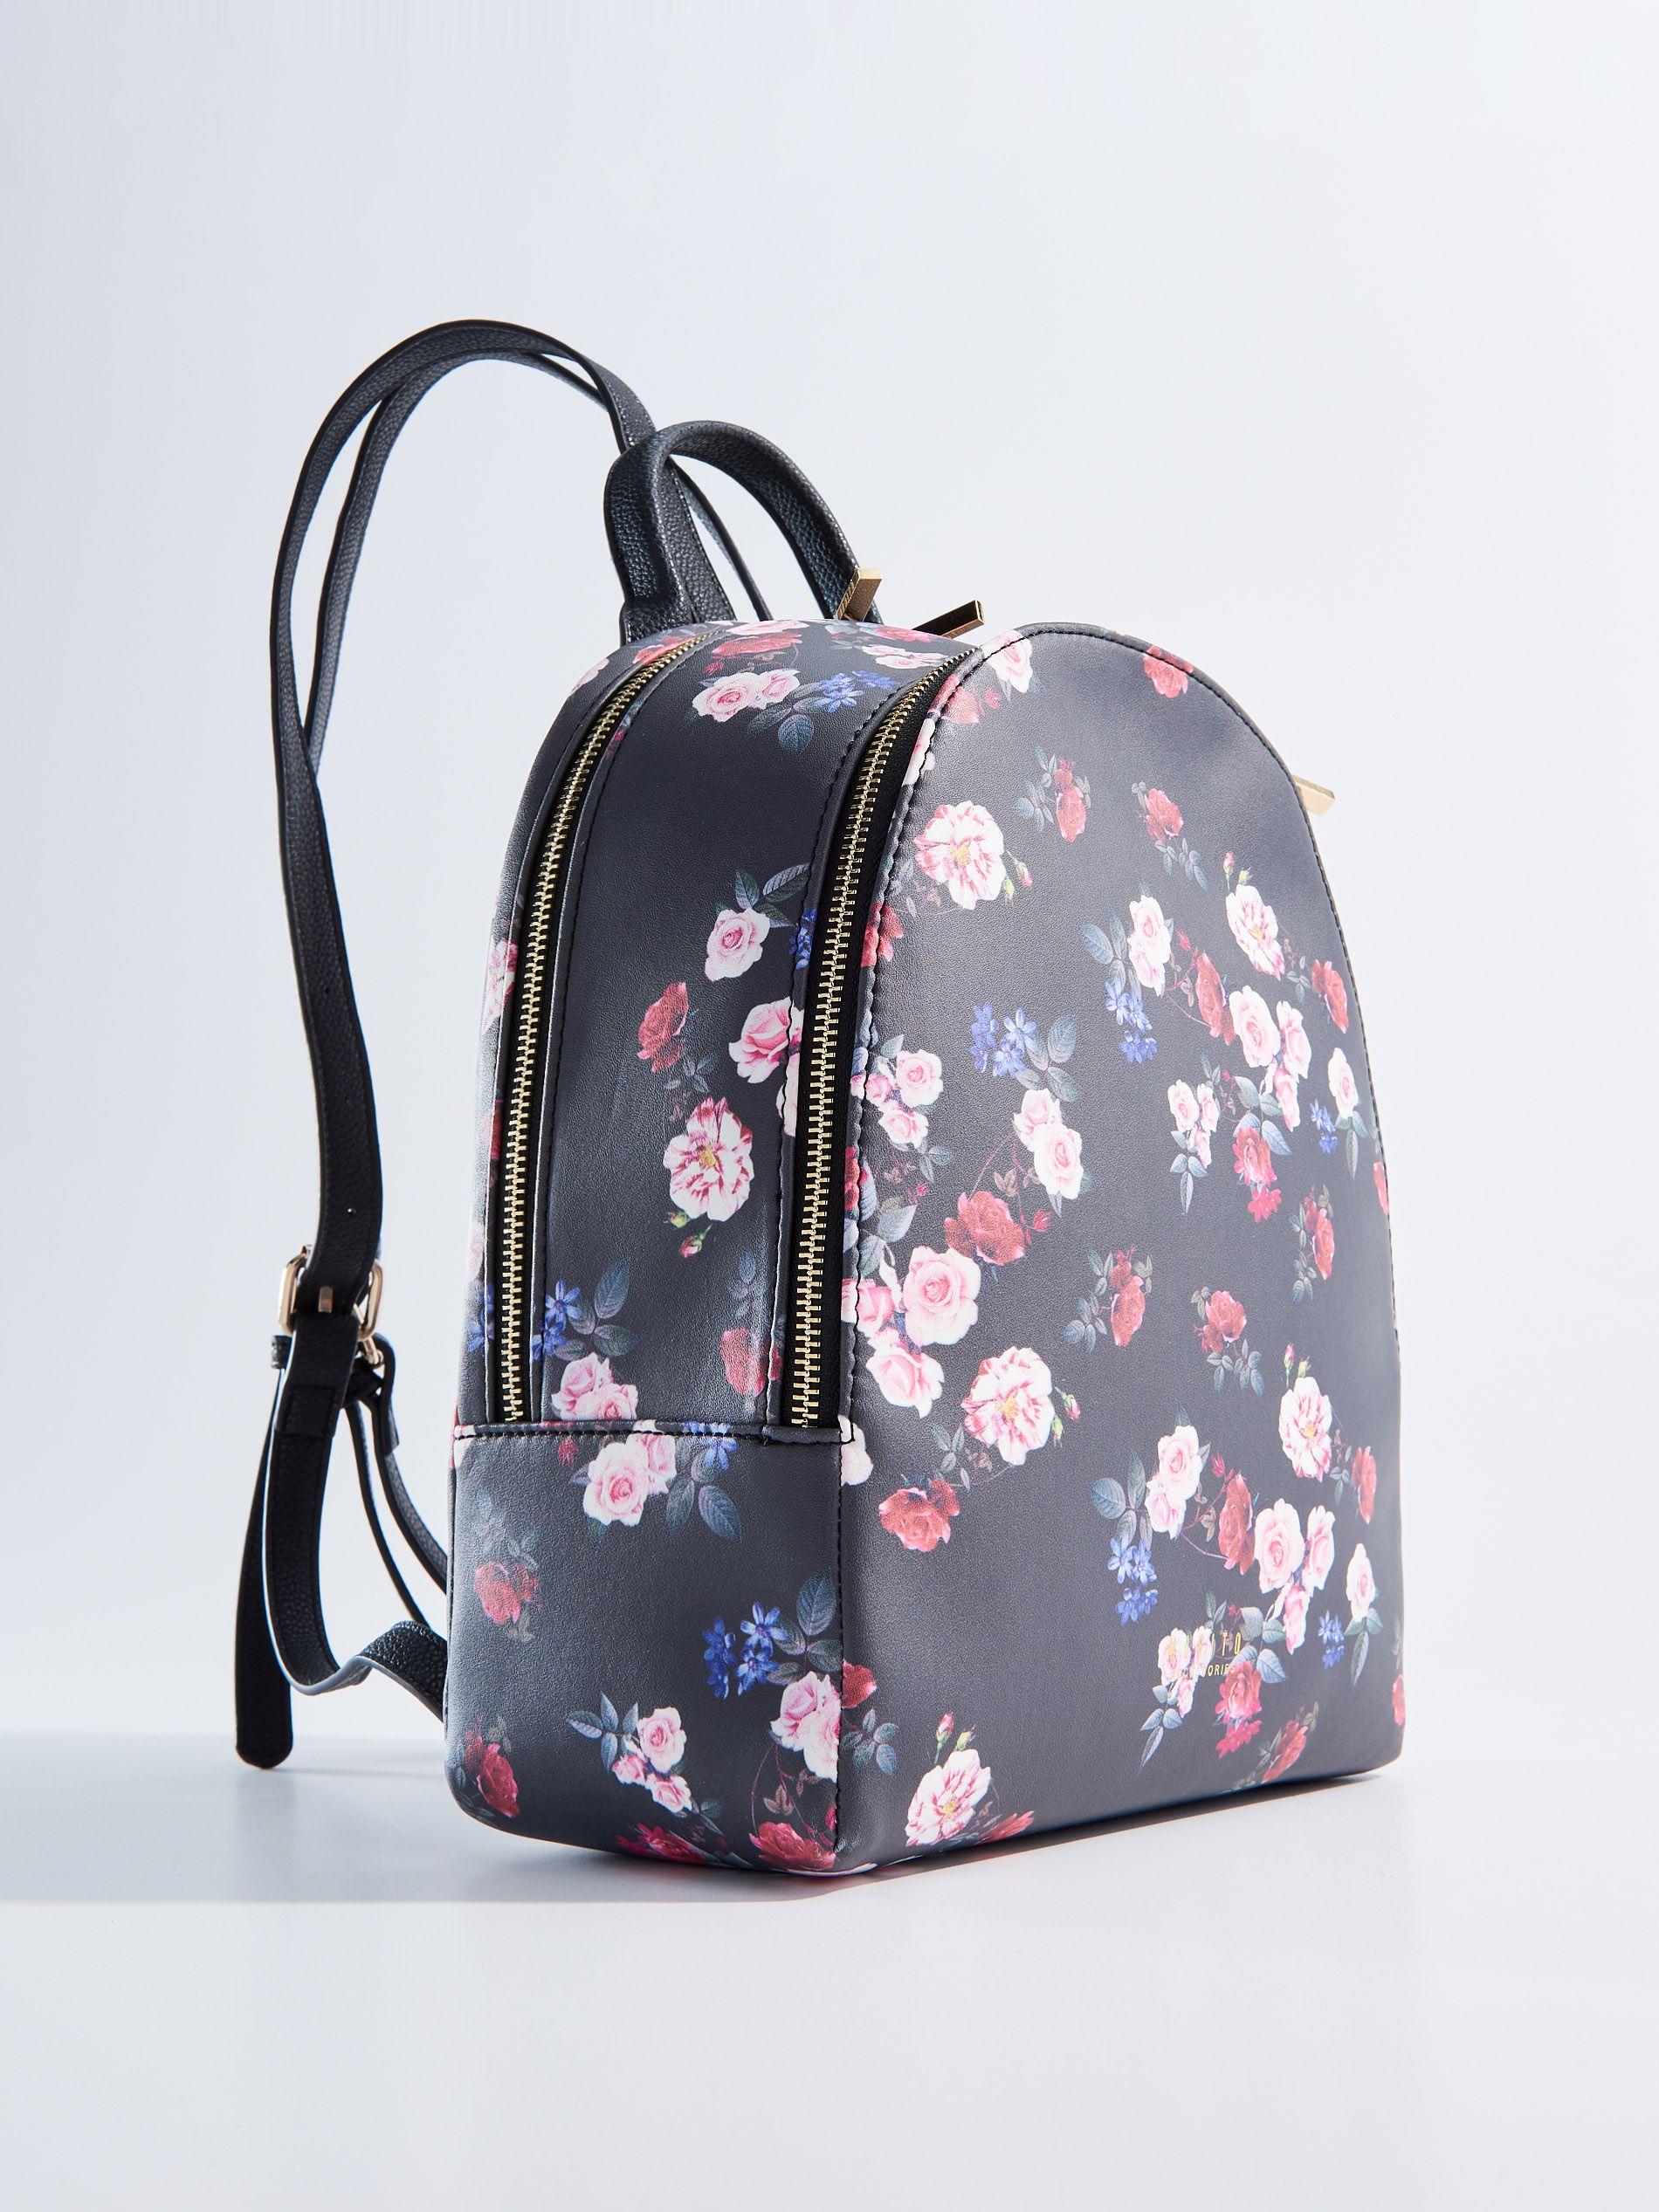 Maly Plecak W Kwiaty Mohito Sx178 Mlc Womens Rucksack Fashion Backpack Bags